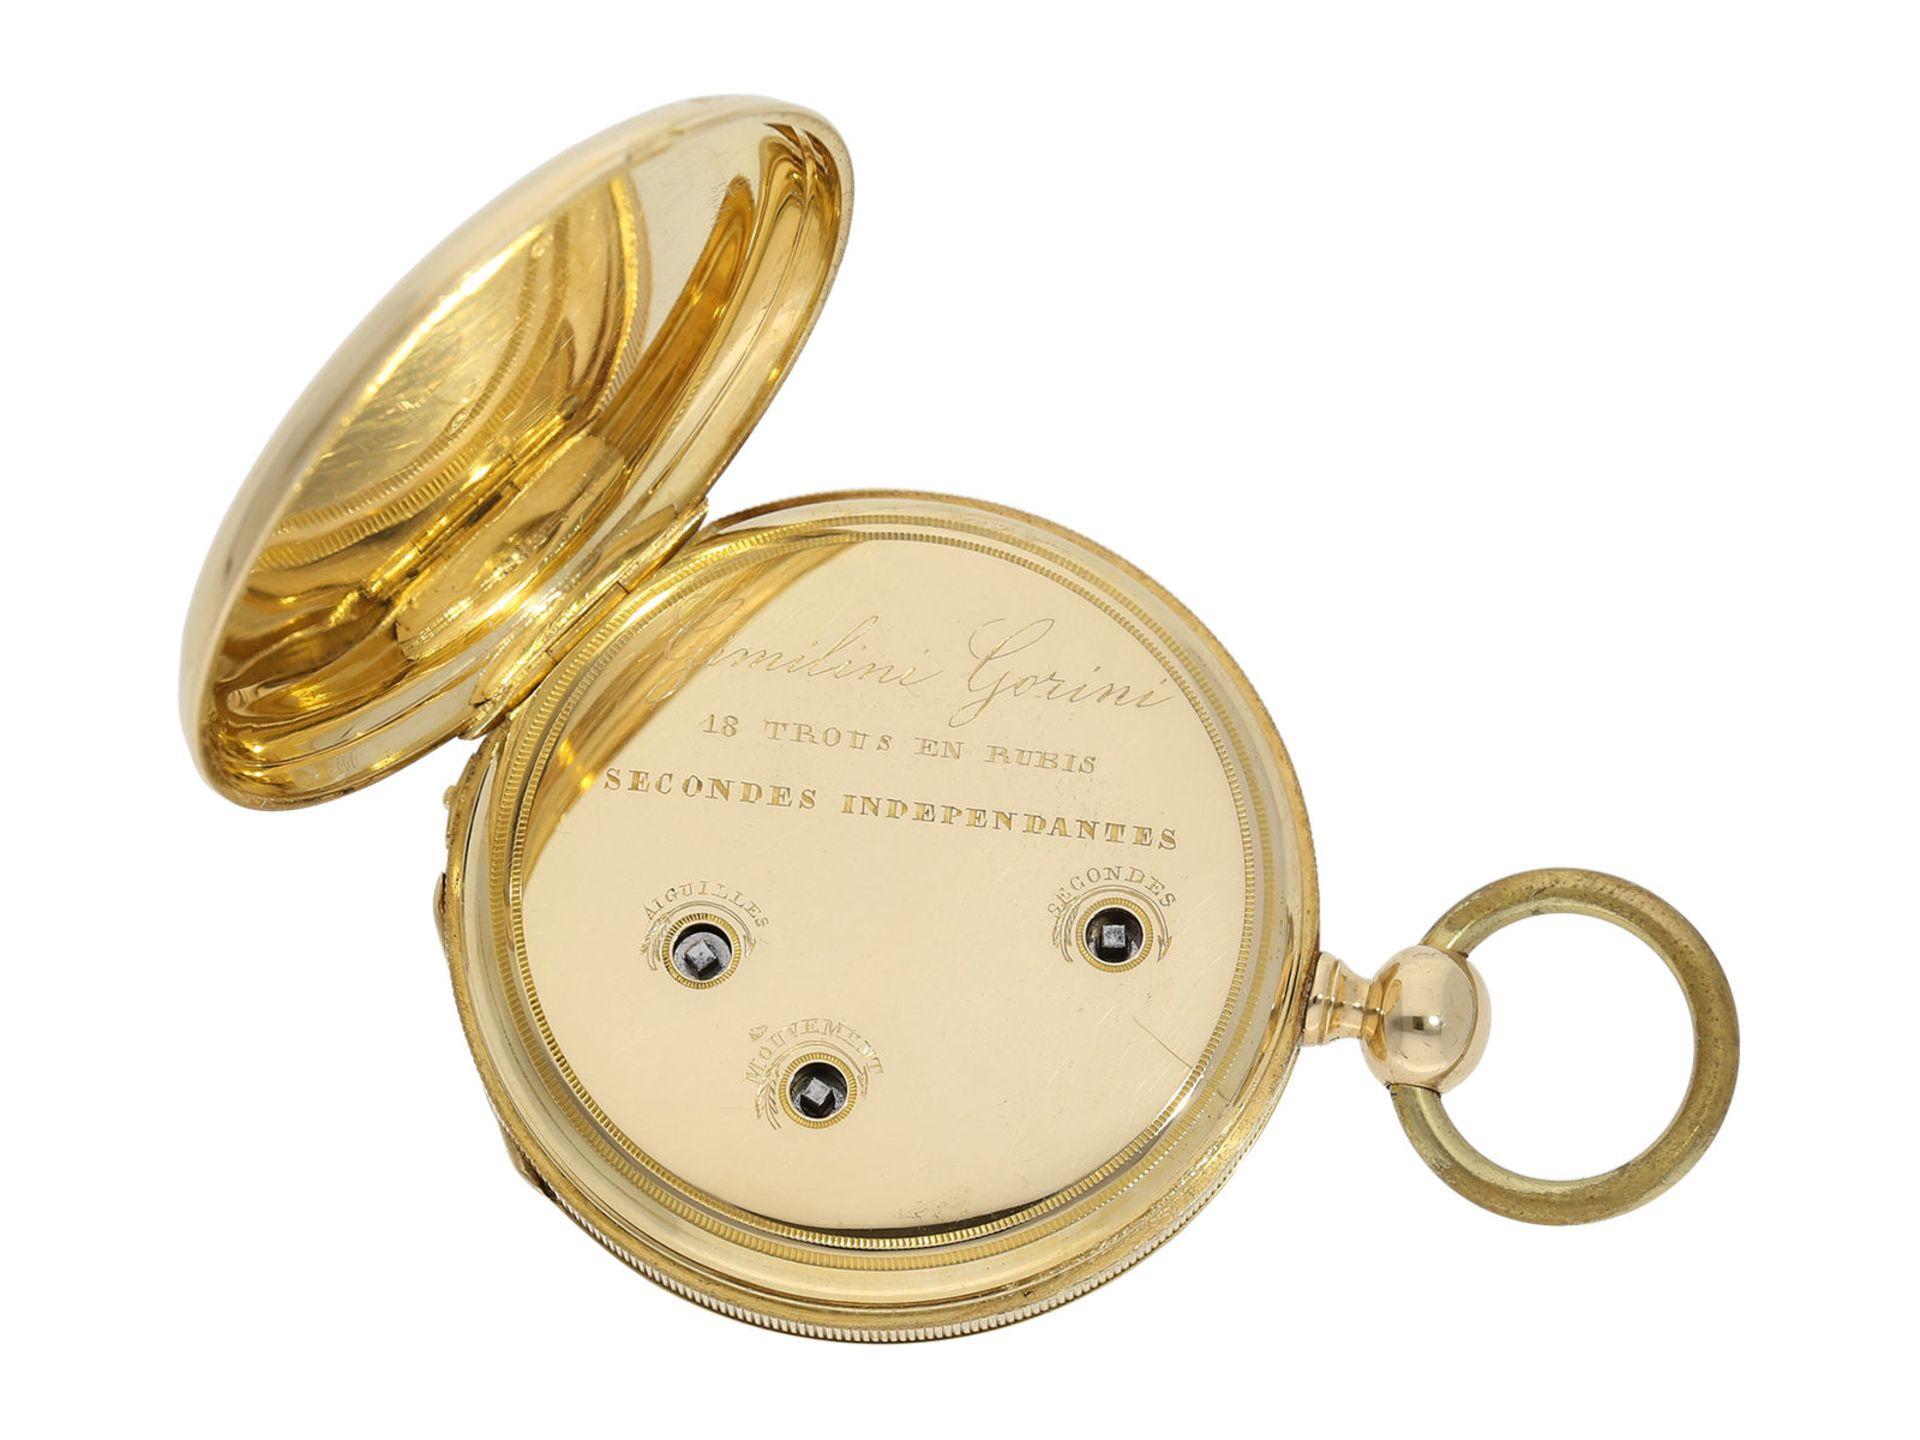 Pocket watch: technically interesting Italian pocket watch with Seconde Morte, Gimilini Gorini, case - Bild 2 aus 6